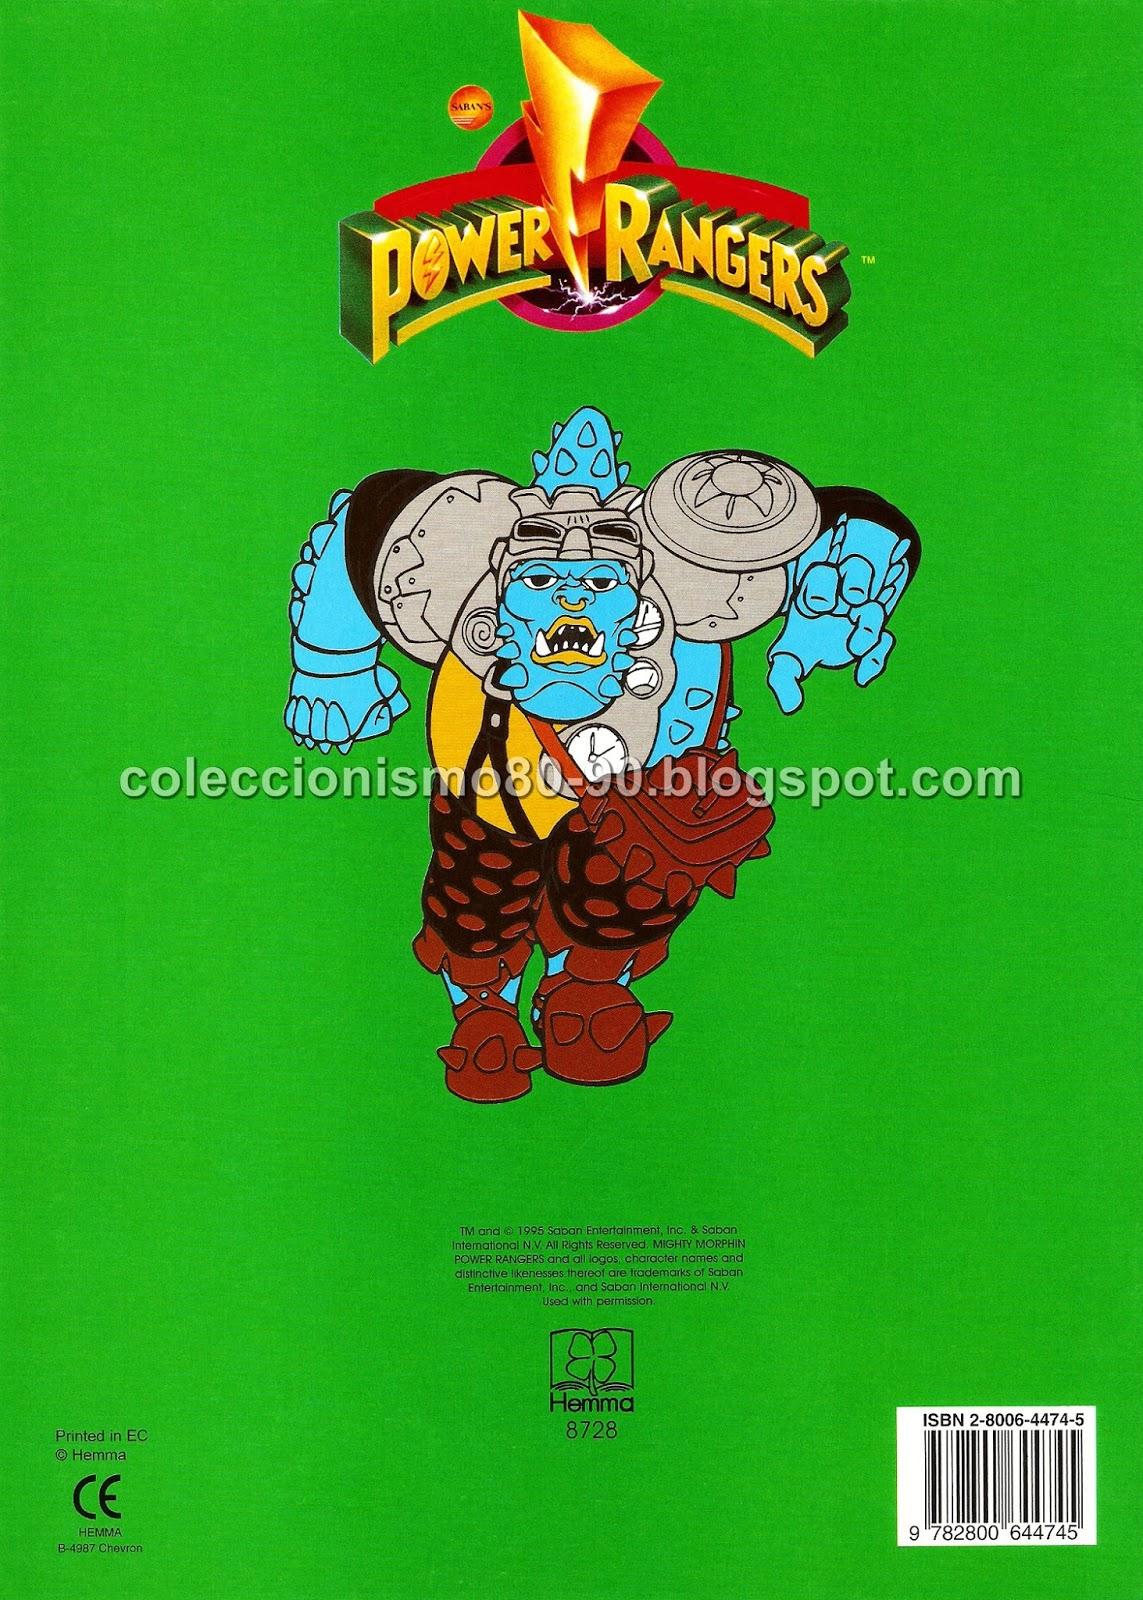 Coleccionismo 80-90: POWER RANGERS: LIBRO PARA COLOREAR